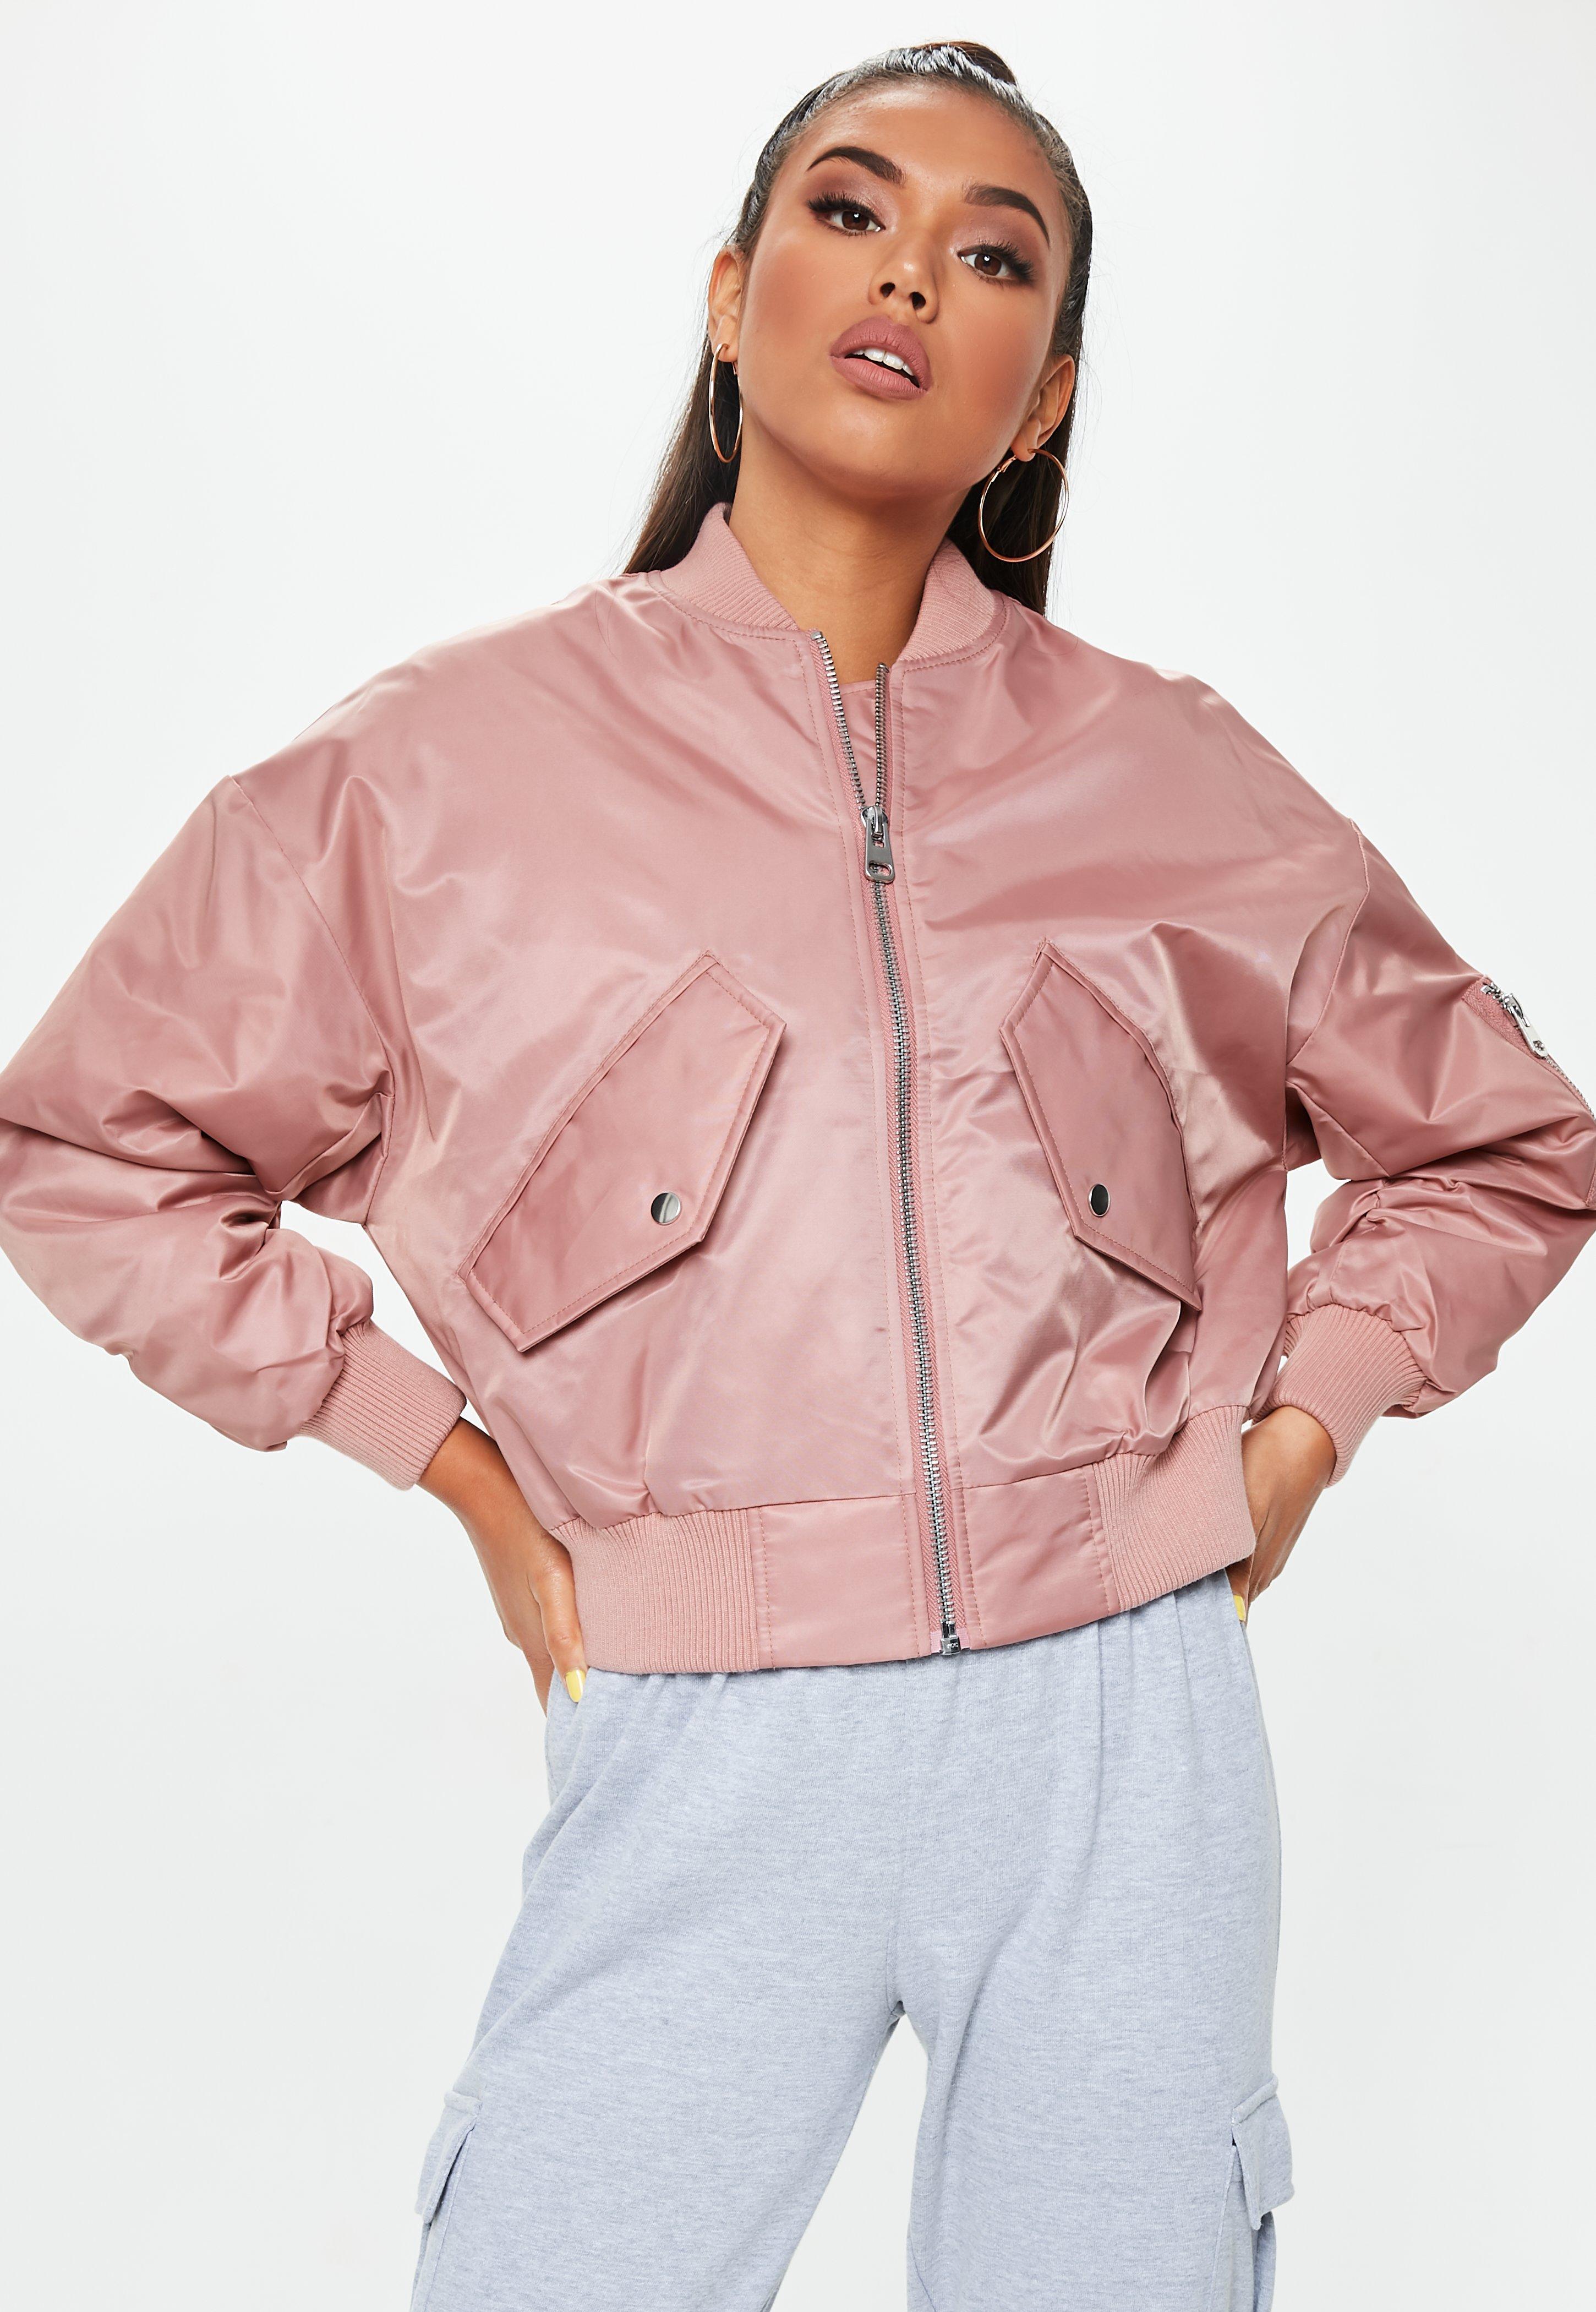 287035ea7 Petite Pink Satin Bomber Jacket